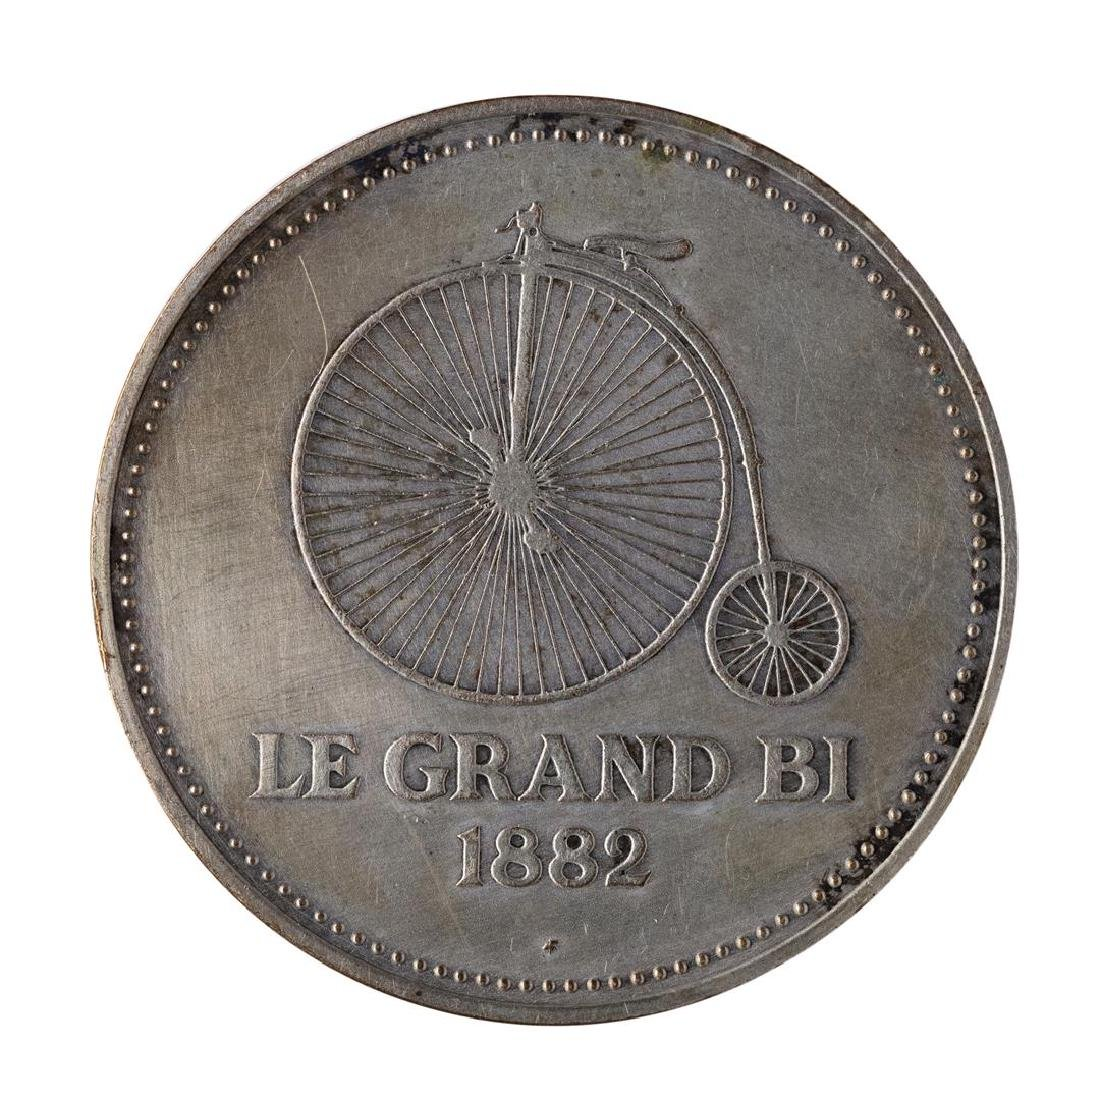 1982 France Peugeot Le Grand Bi Medal